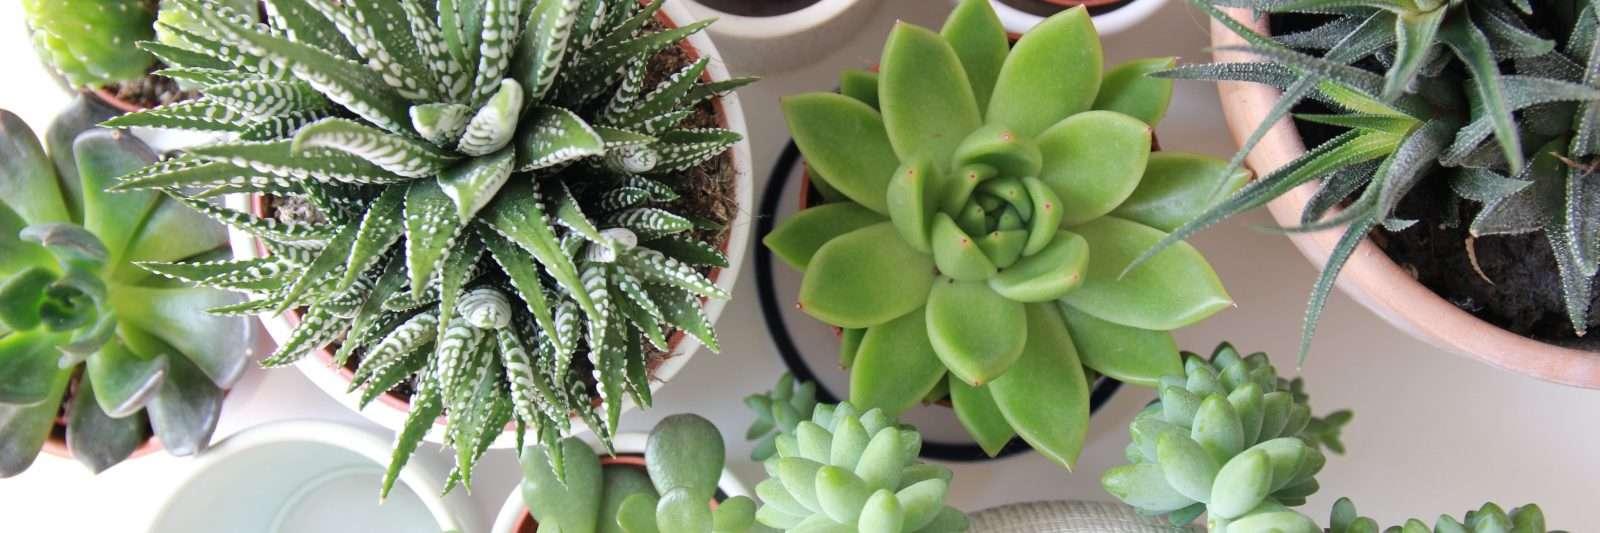 Low-Maintenance Houseplants for Beginners